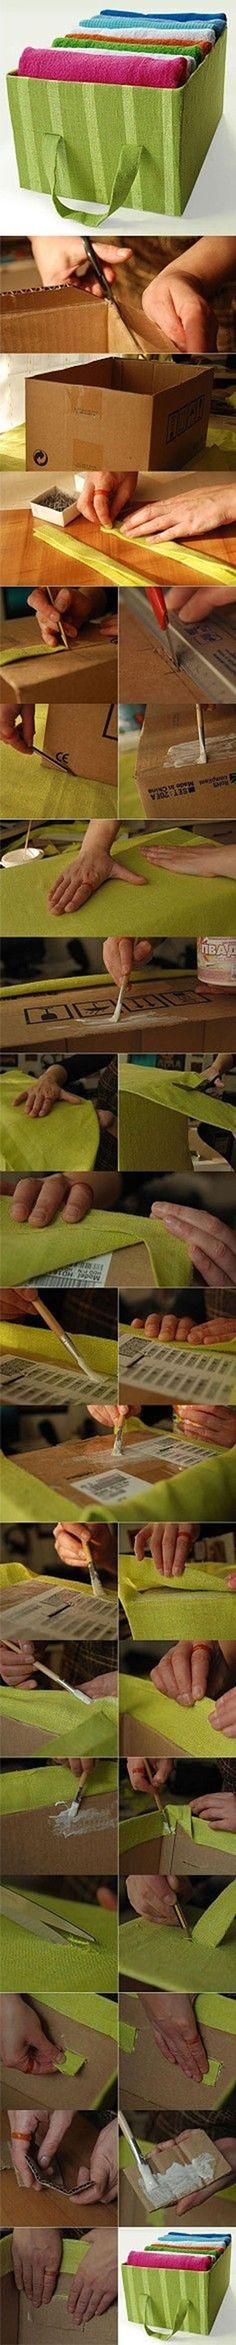 Easy And Useful DIY